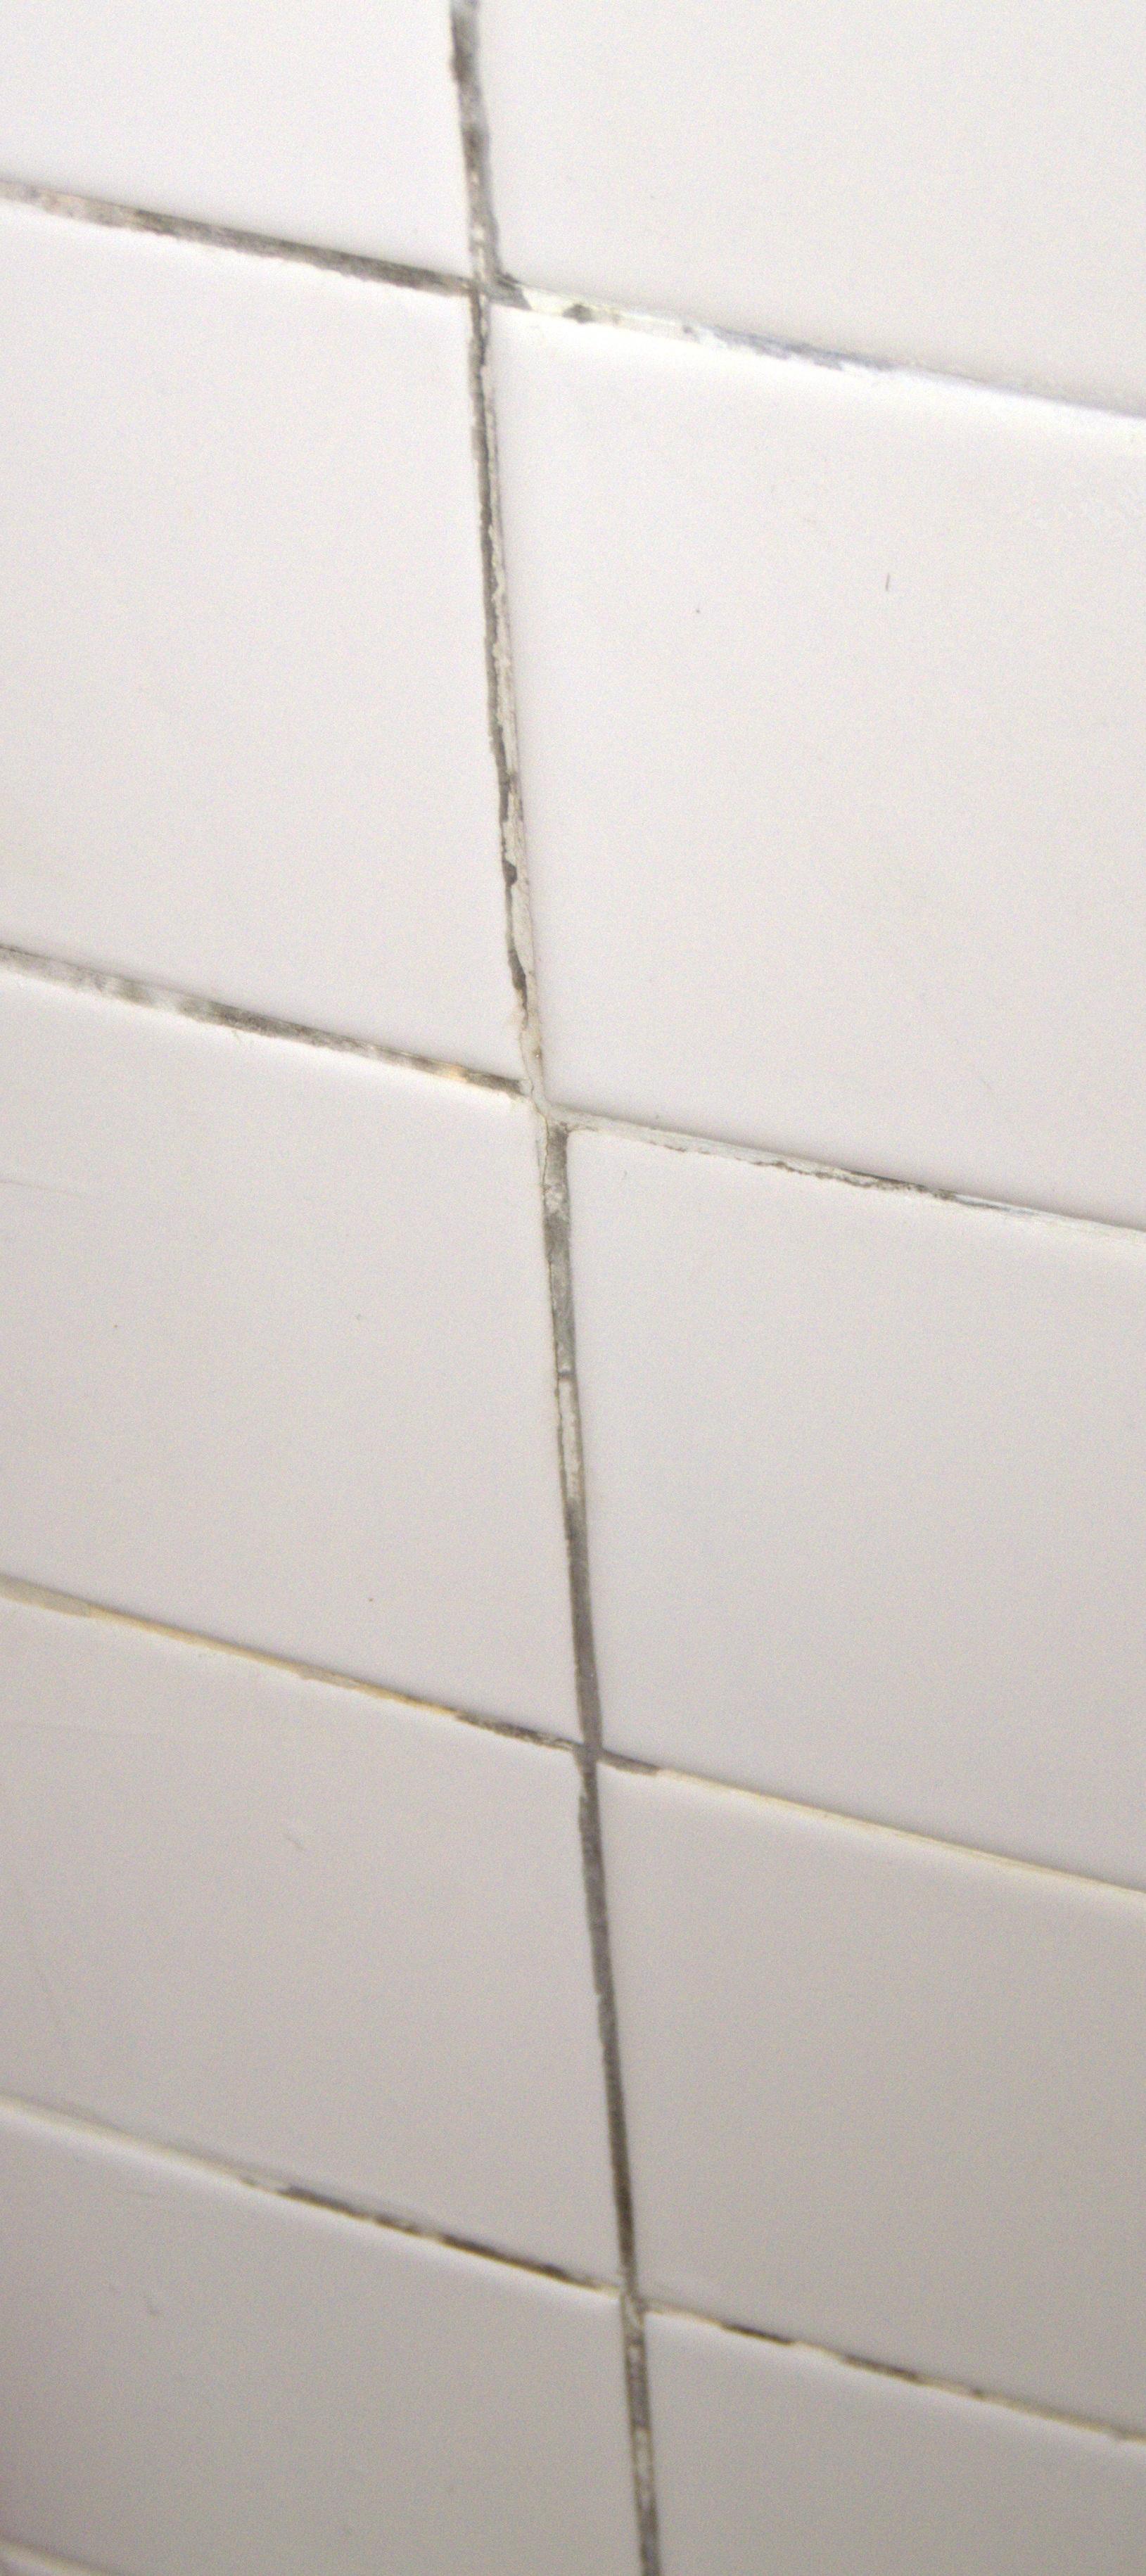 Black Mold On Bathroom Tiles With Wonderful Photo   eyagci.com